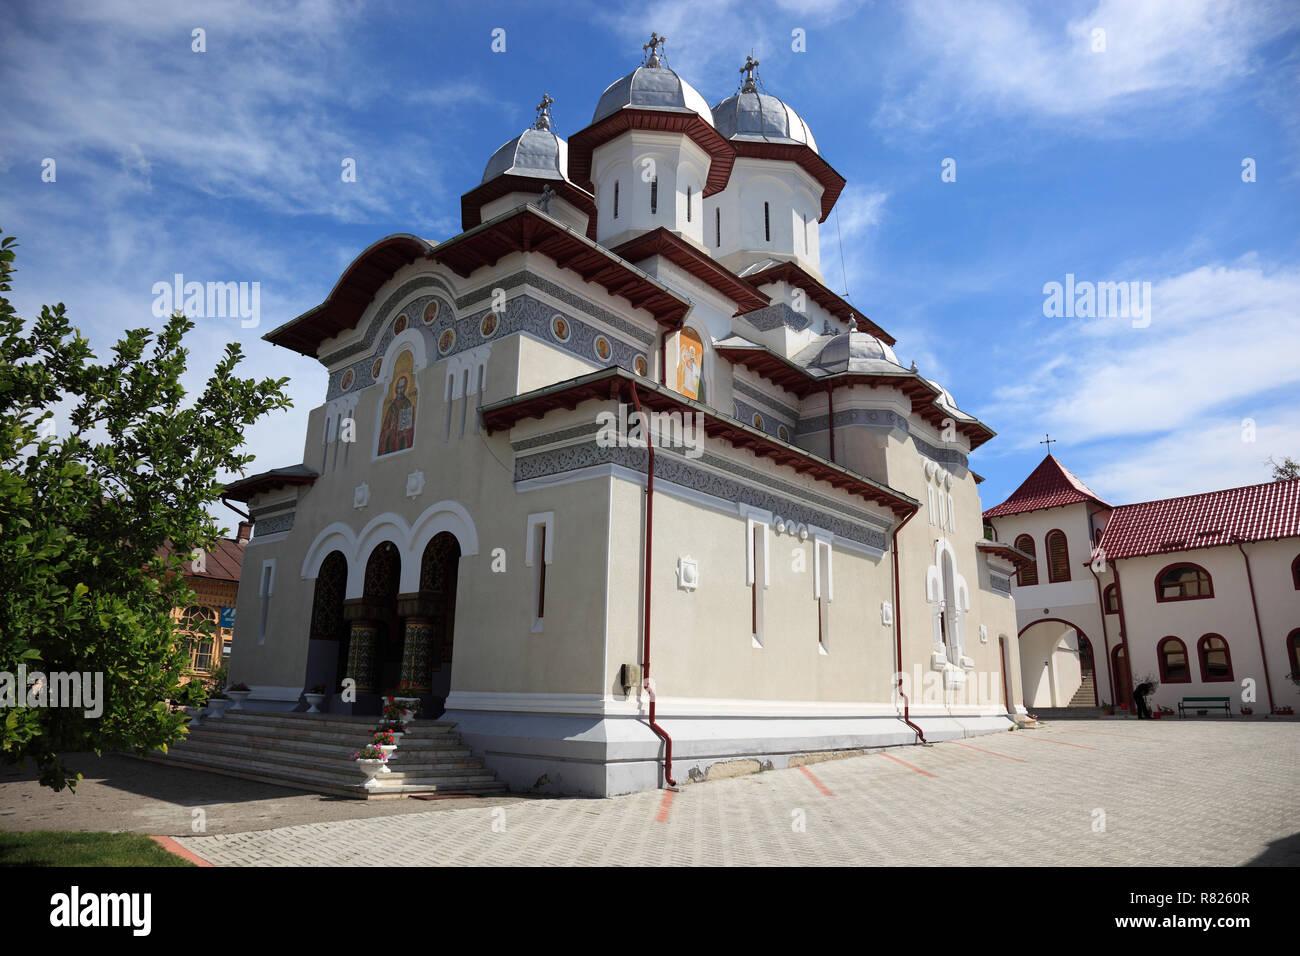 Church of Saint Nicholas the Younger from Curtea de Arges, Walachei, Romania - Stock Image